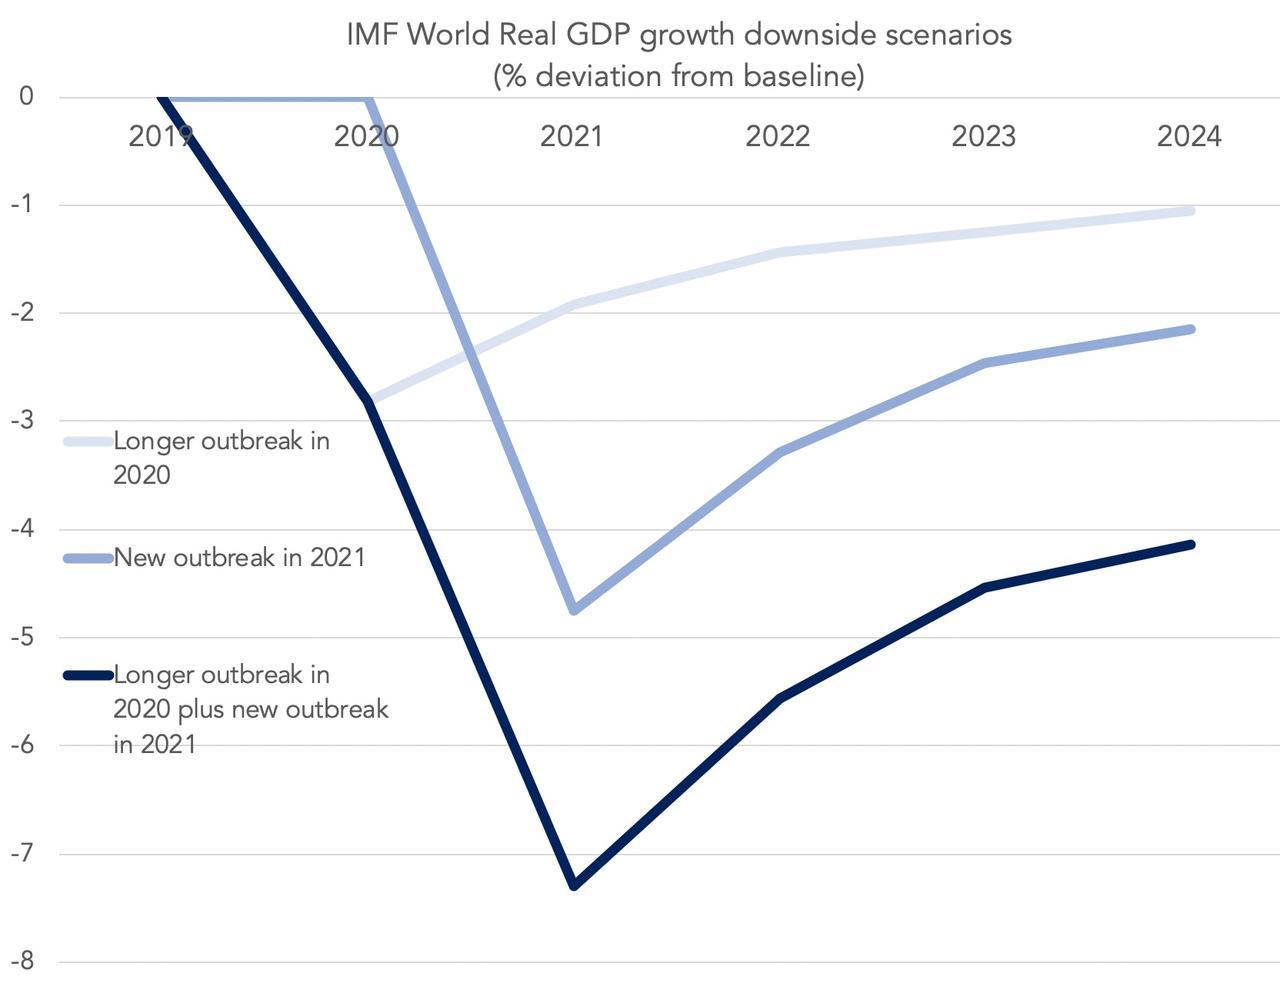 IMF world real GDP growth downside scenarios